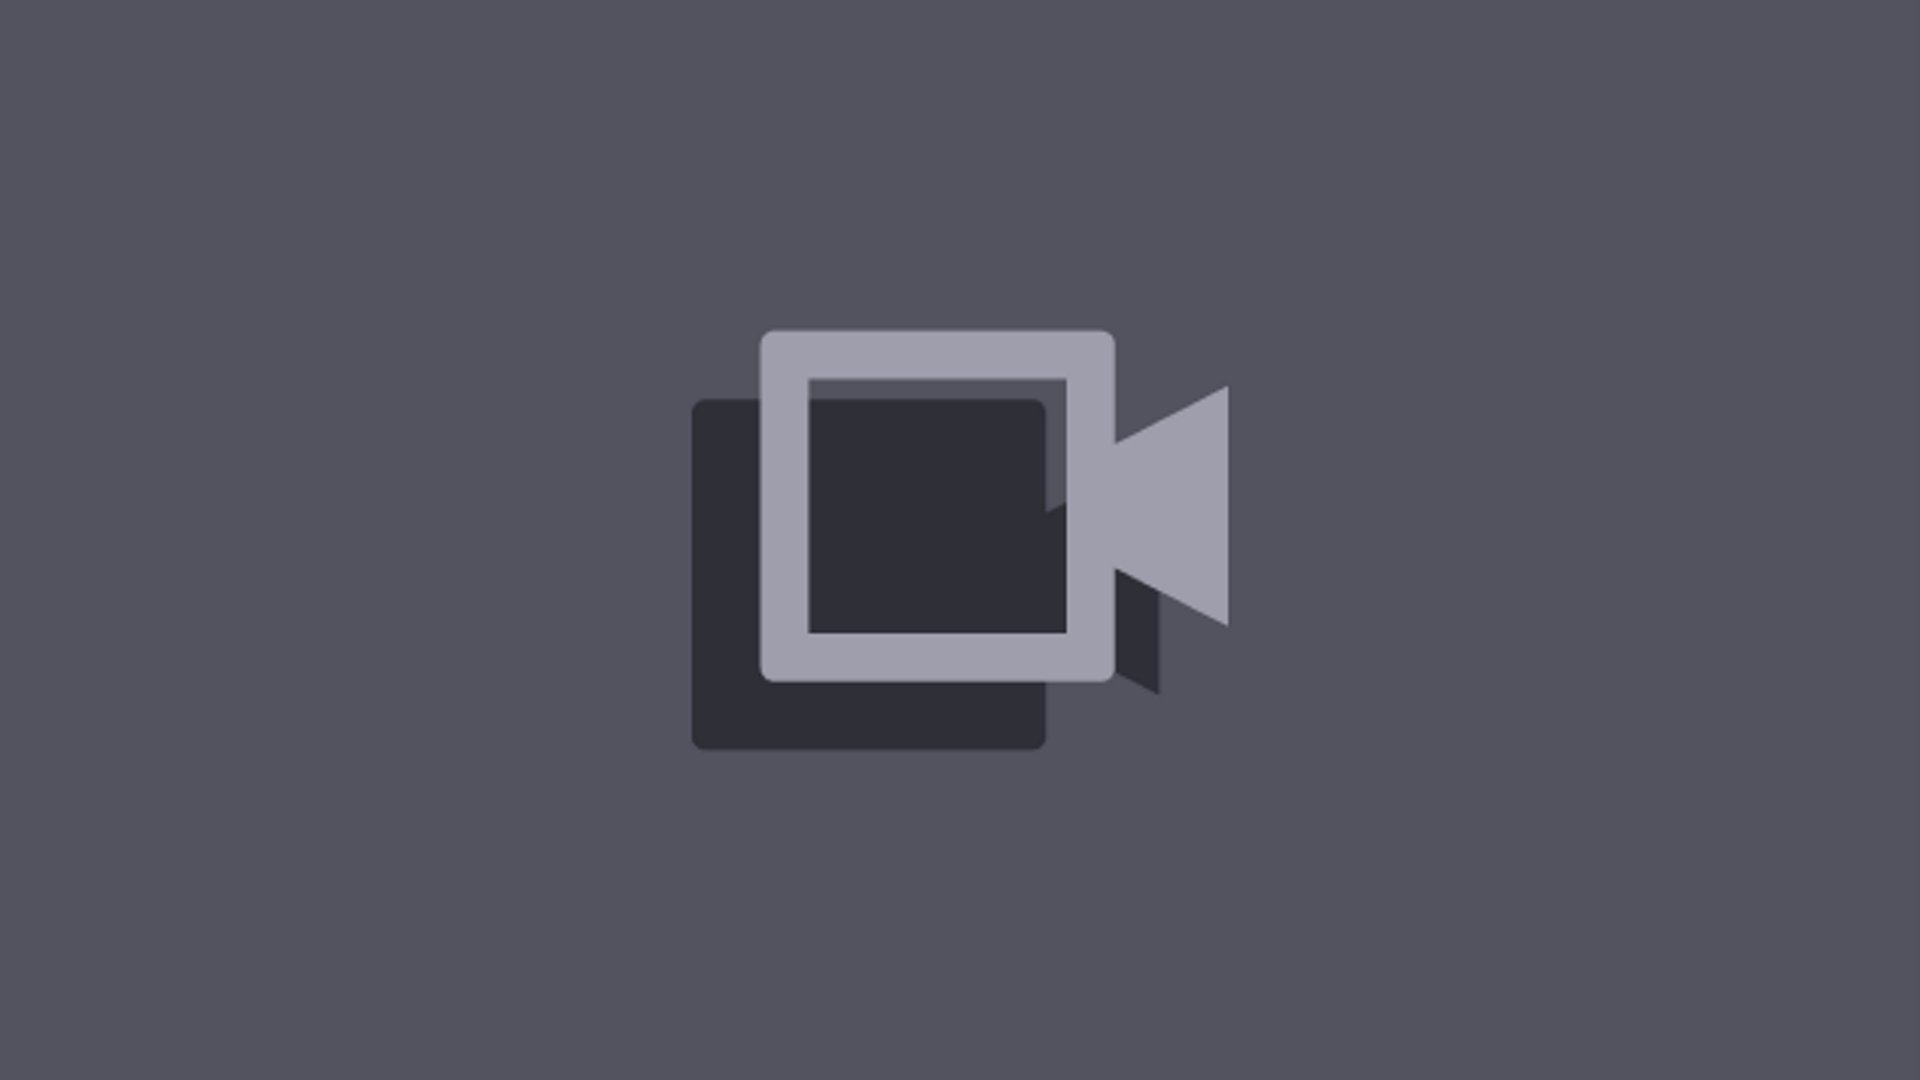 Twitch stream of CyberLiveArena1